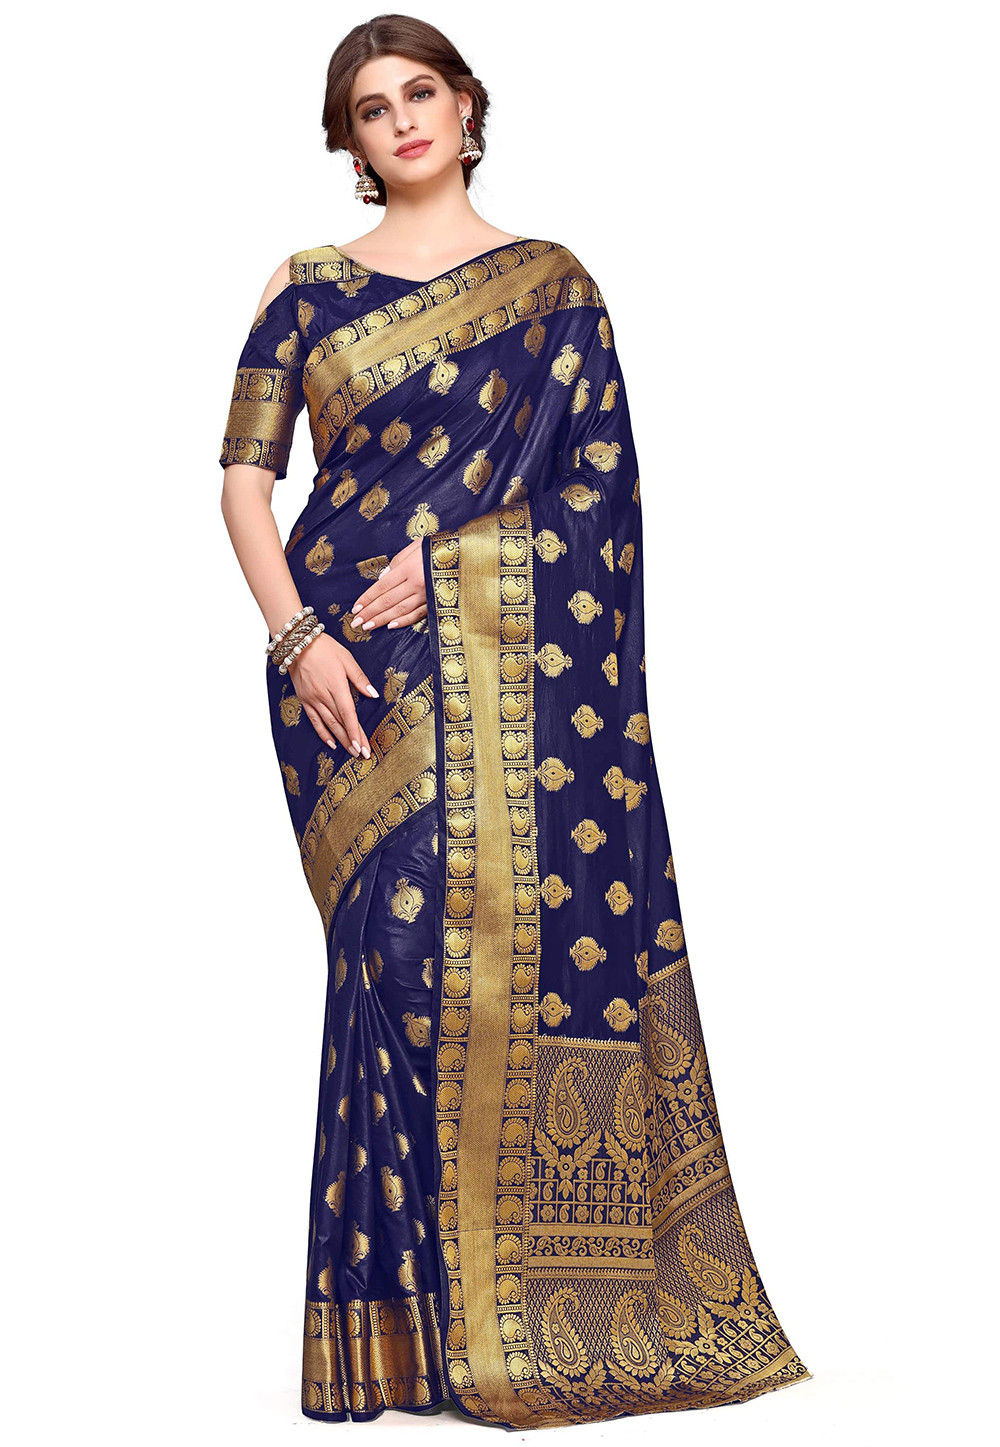 Kanchipuram Silk Saree in Navy Blue